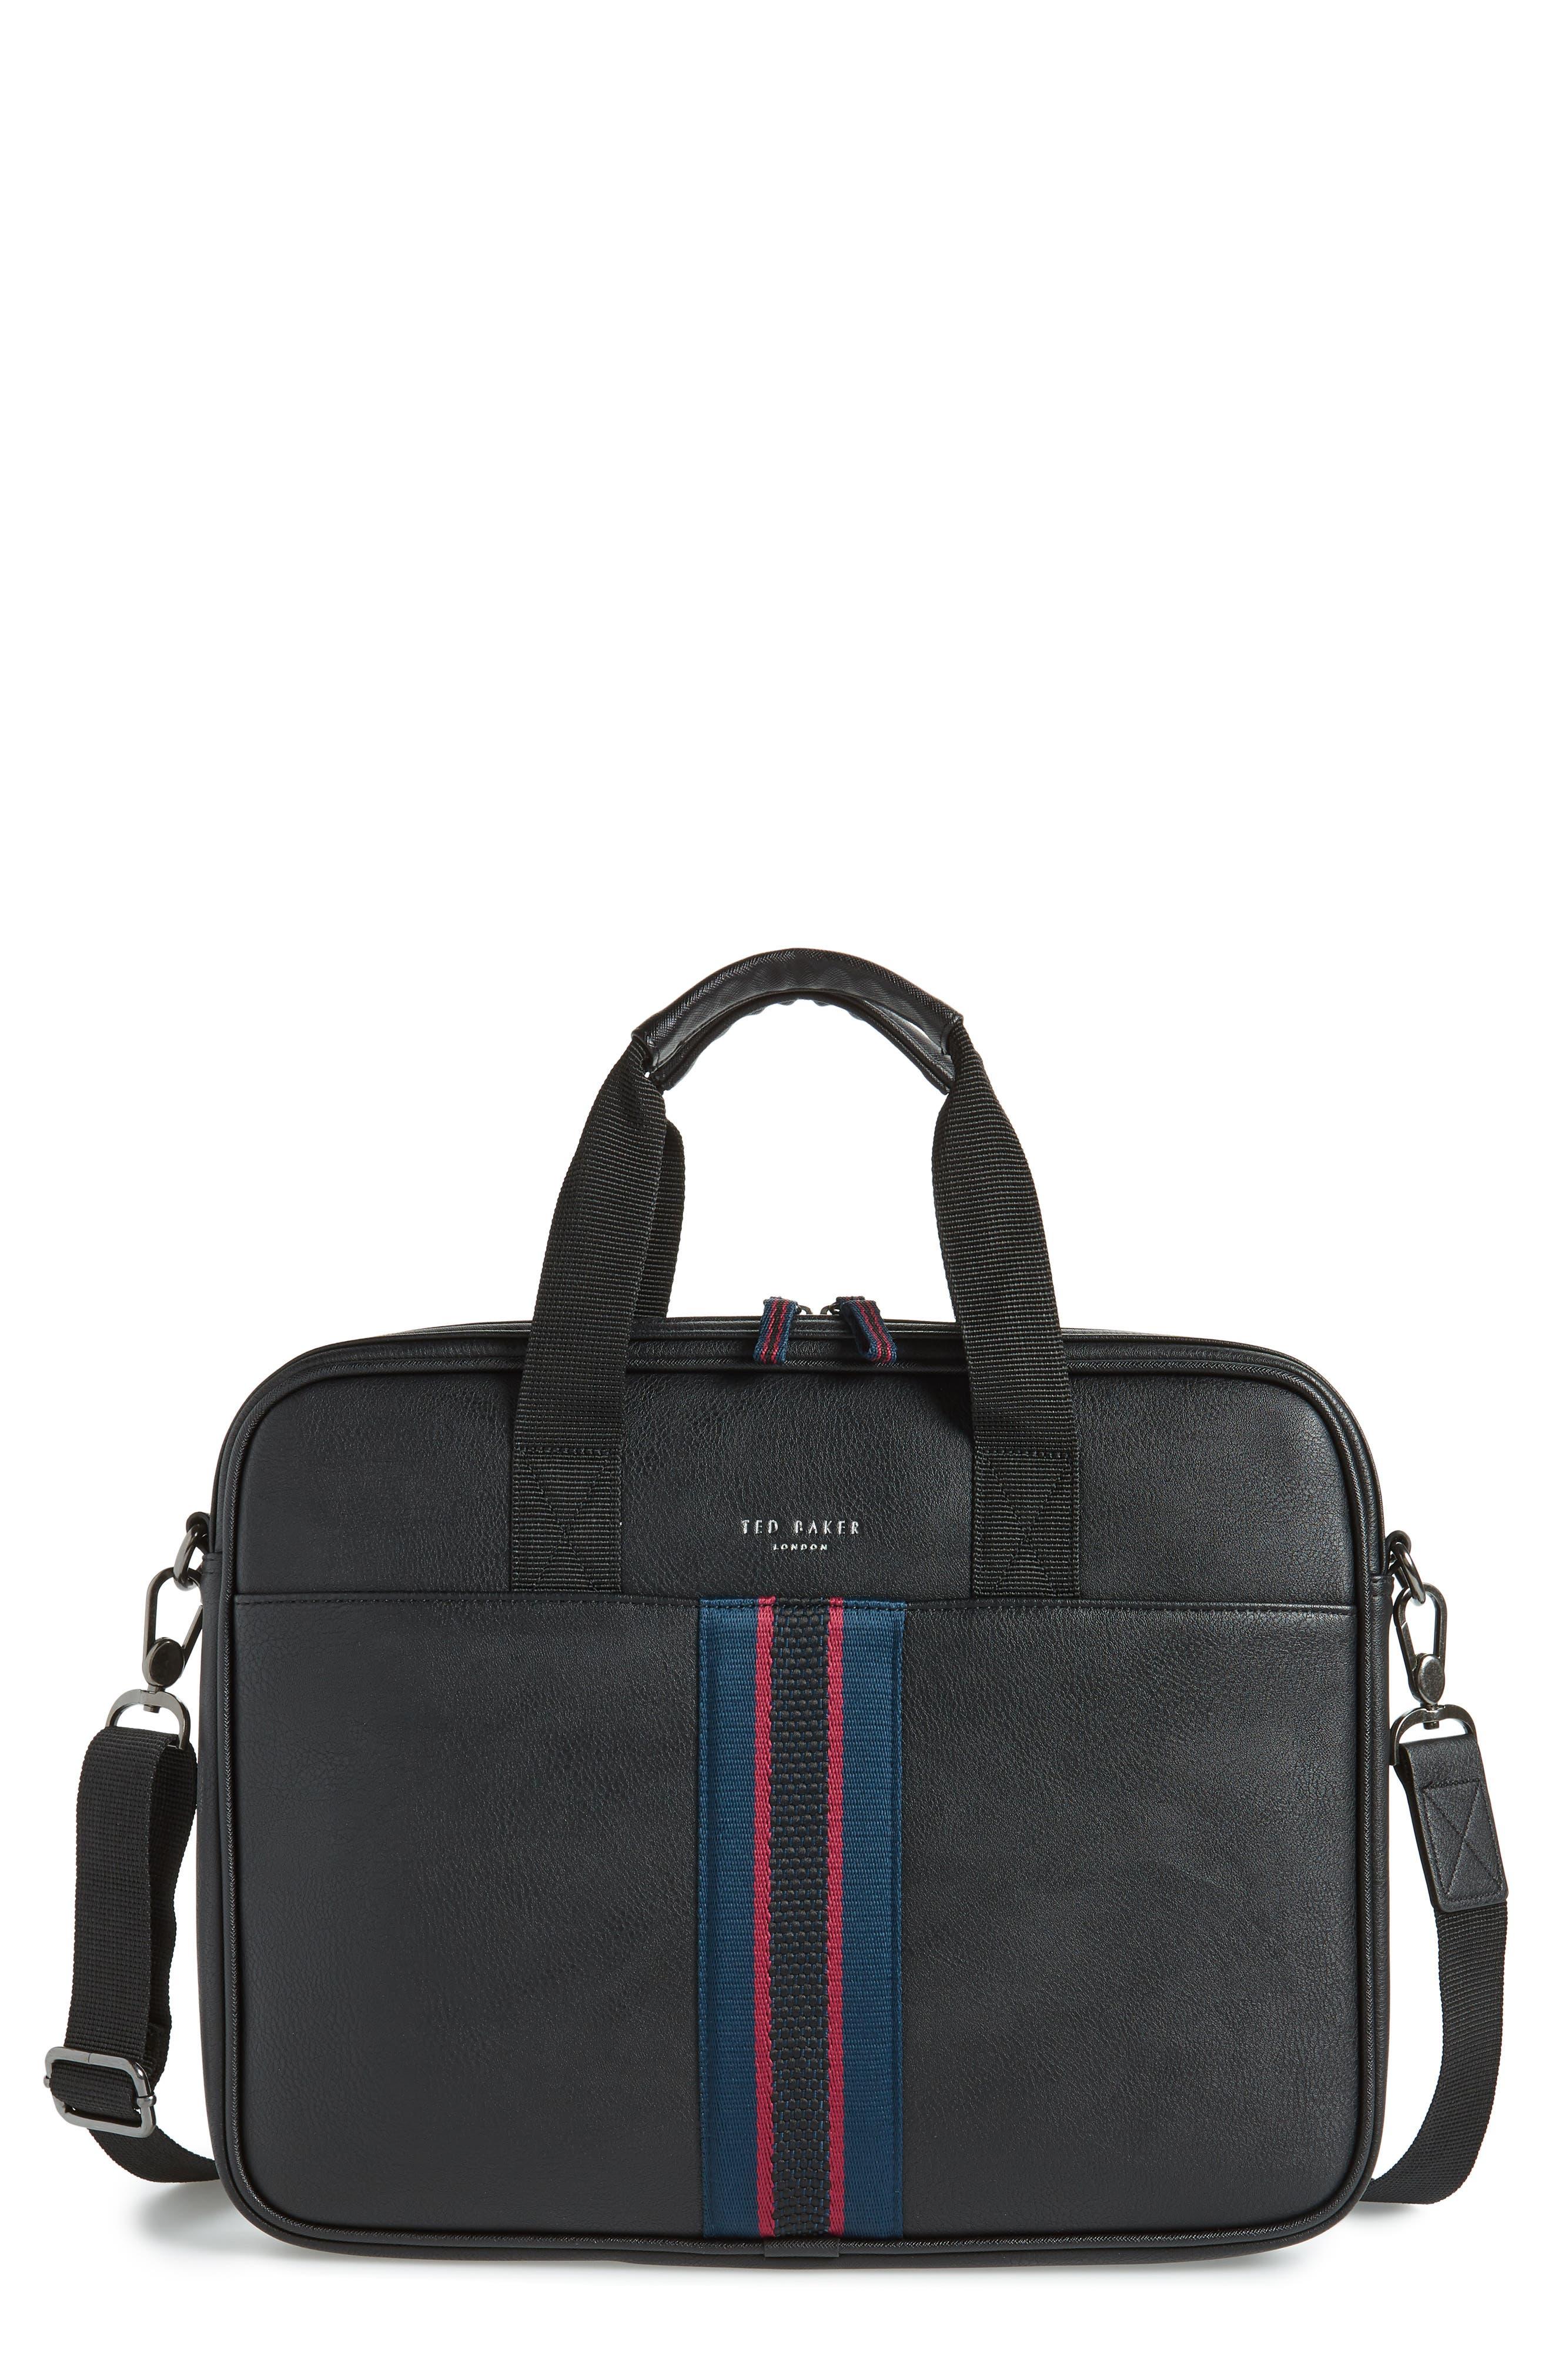 TED BAKER LONDON Faux Leather Document Bag, Main, color, BLACK